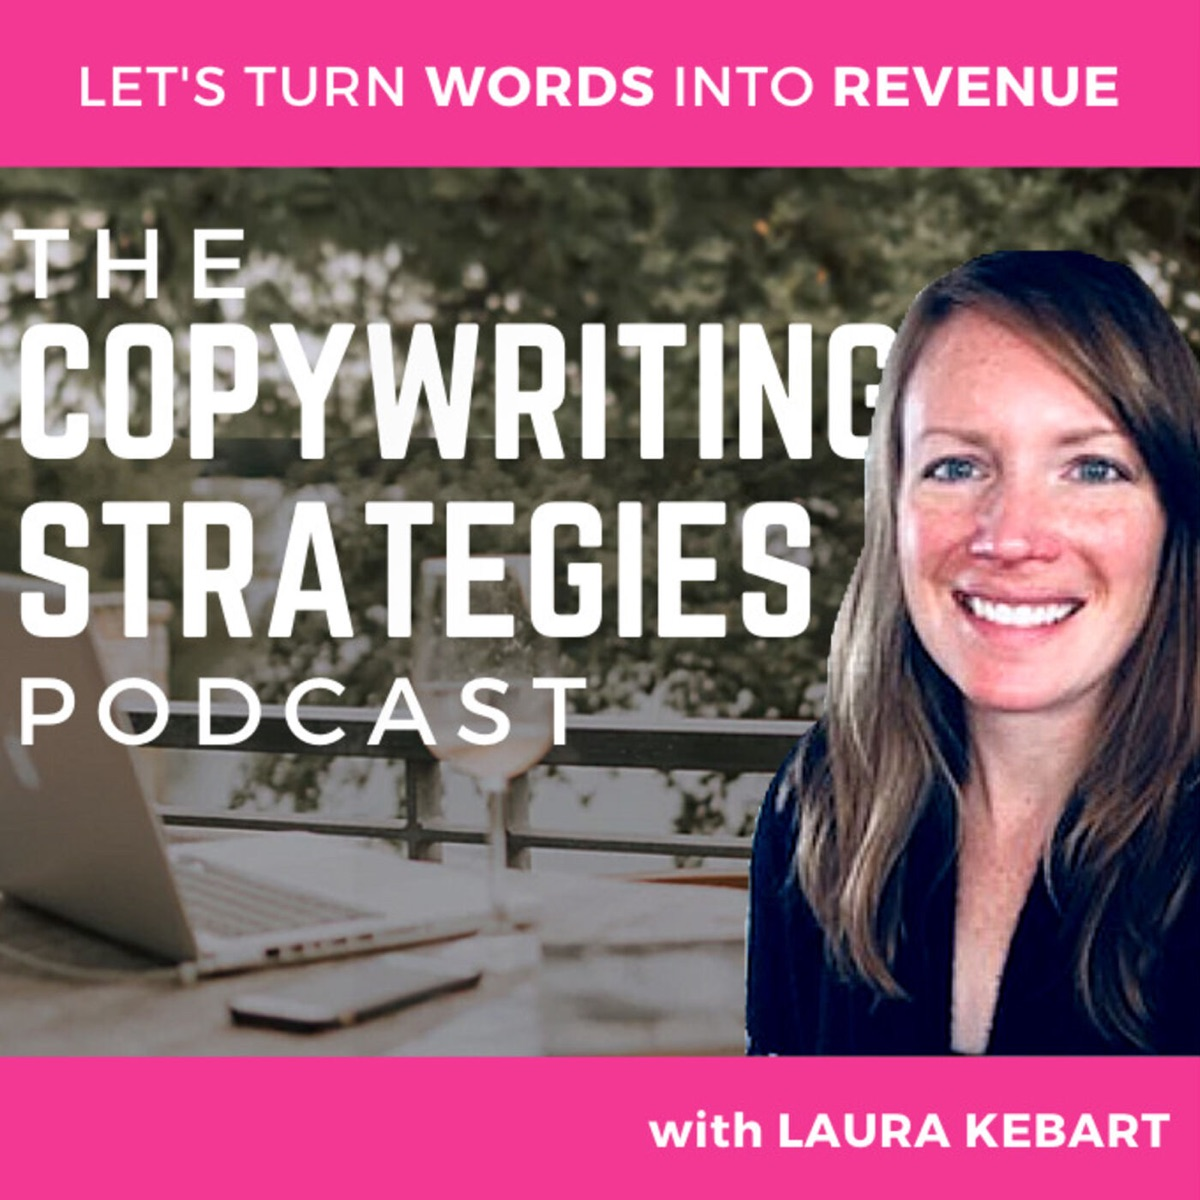 The Copywriting Strategies Podcast